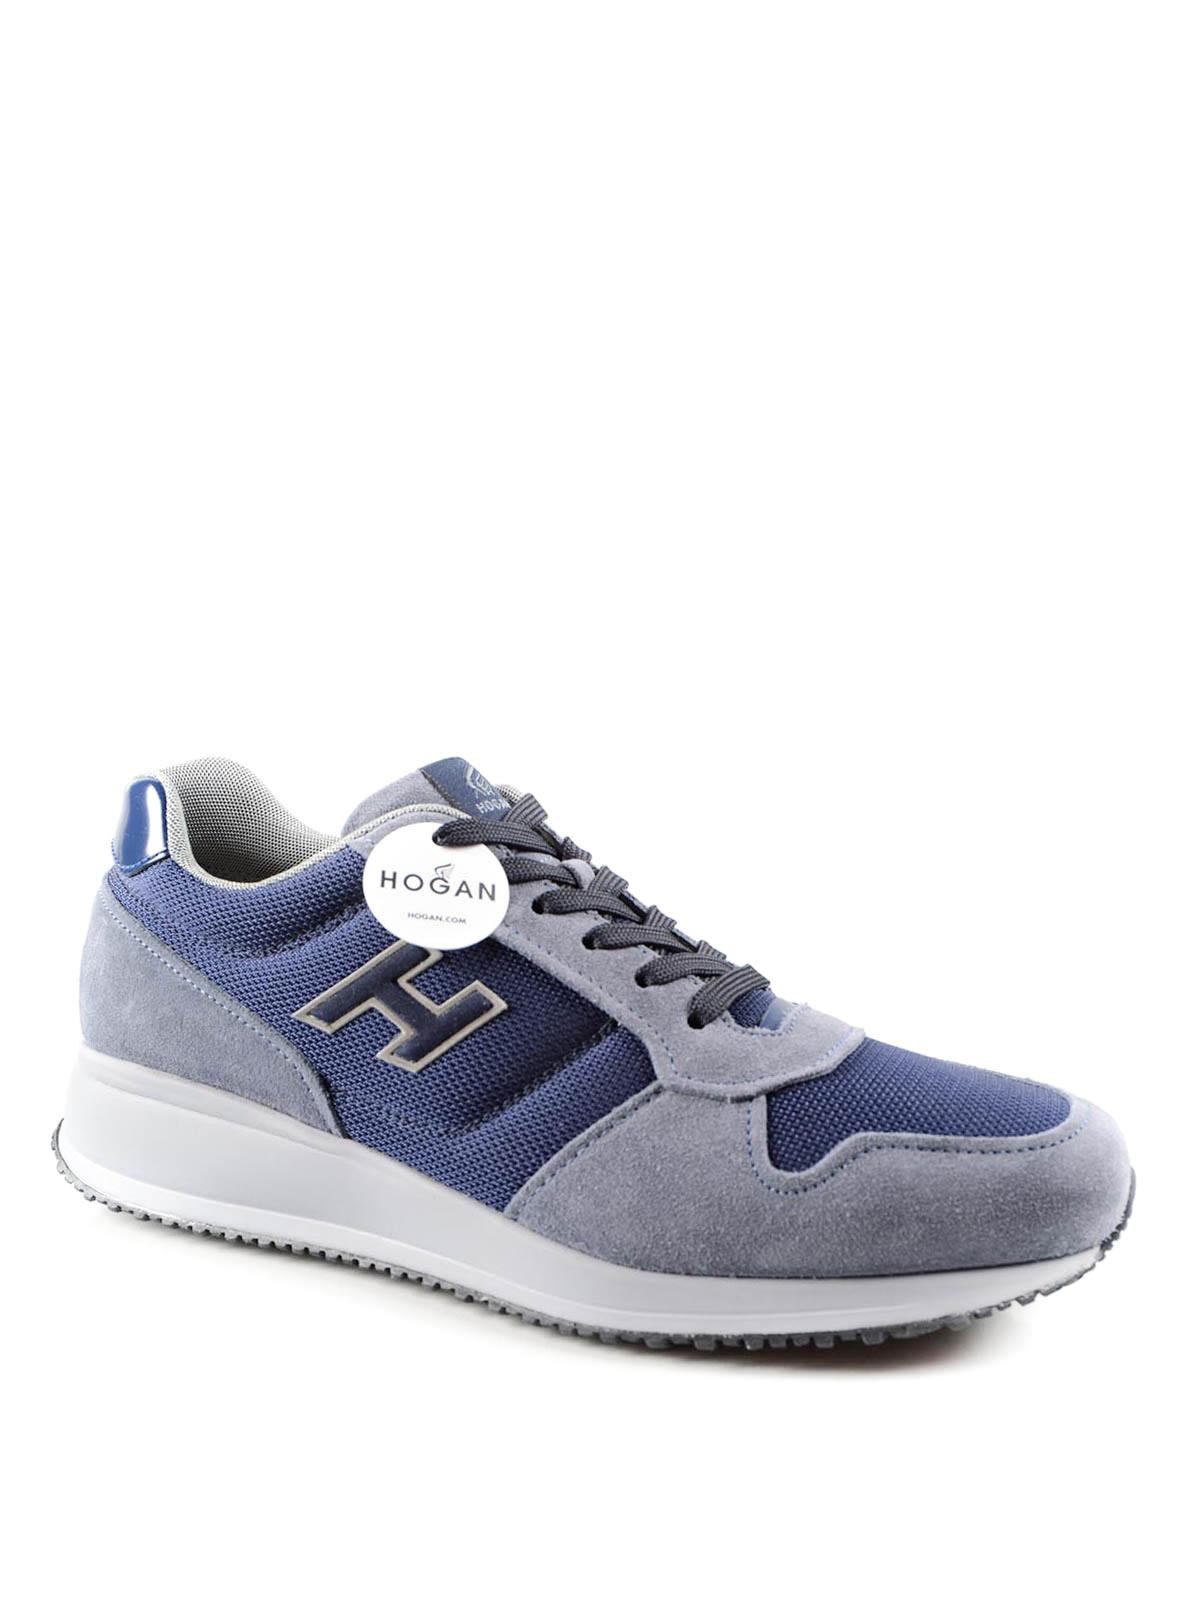 baskets interactive n20 pour homme de hogan chaussures de sport ikrix ikrix. Black Bedroom Furniture Sets. Home Design Ideas